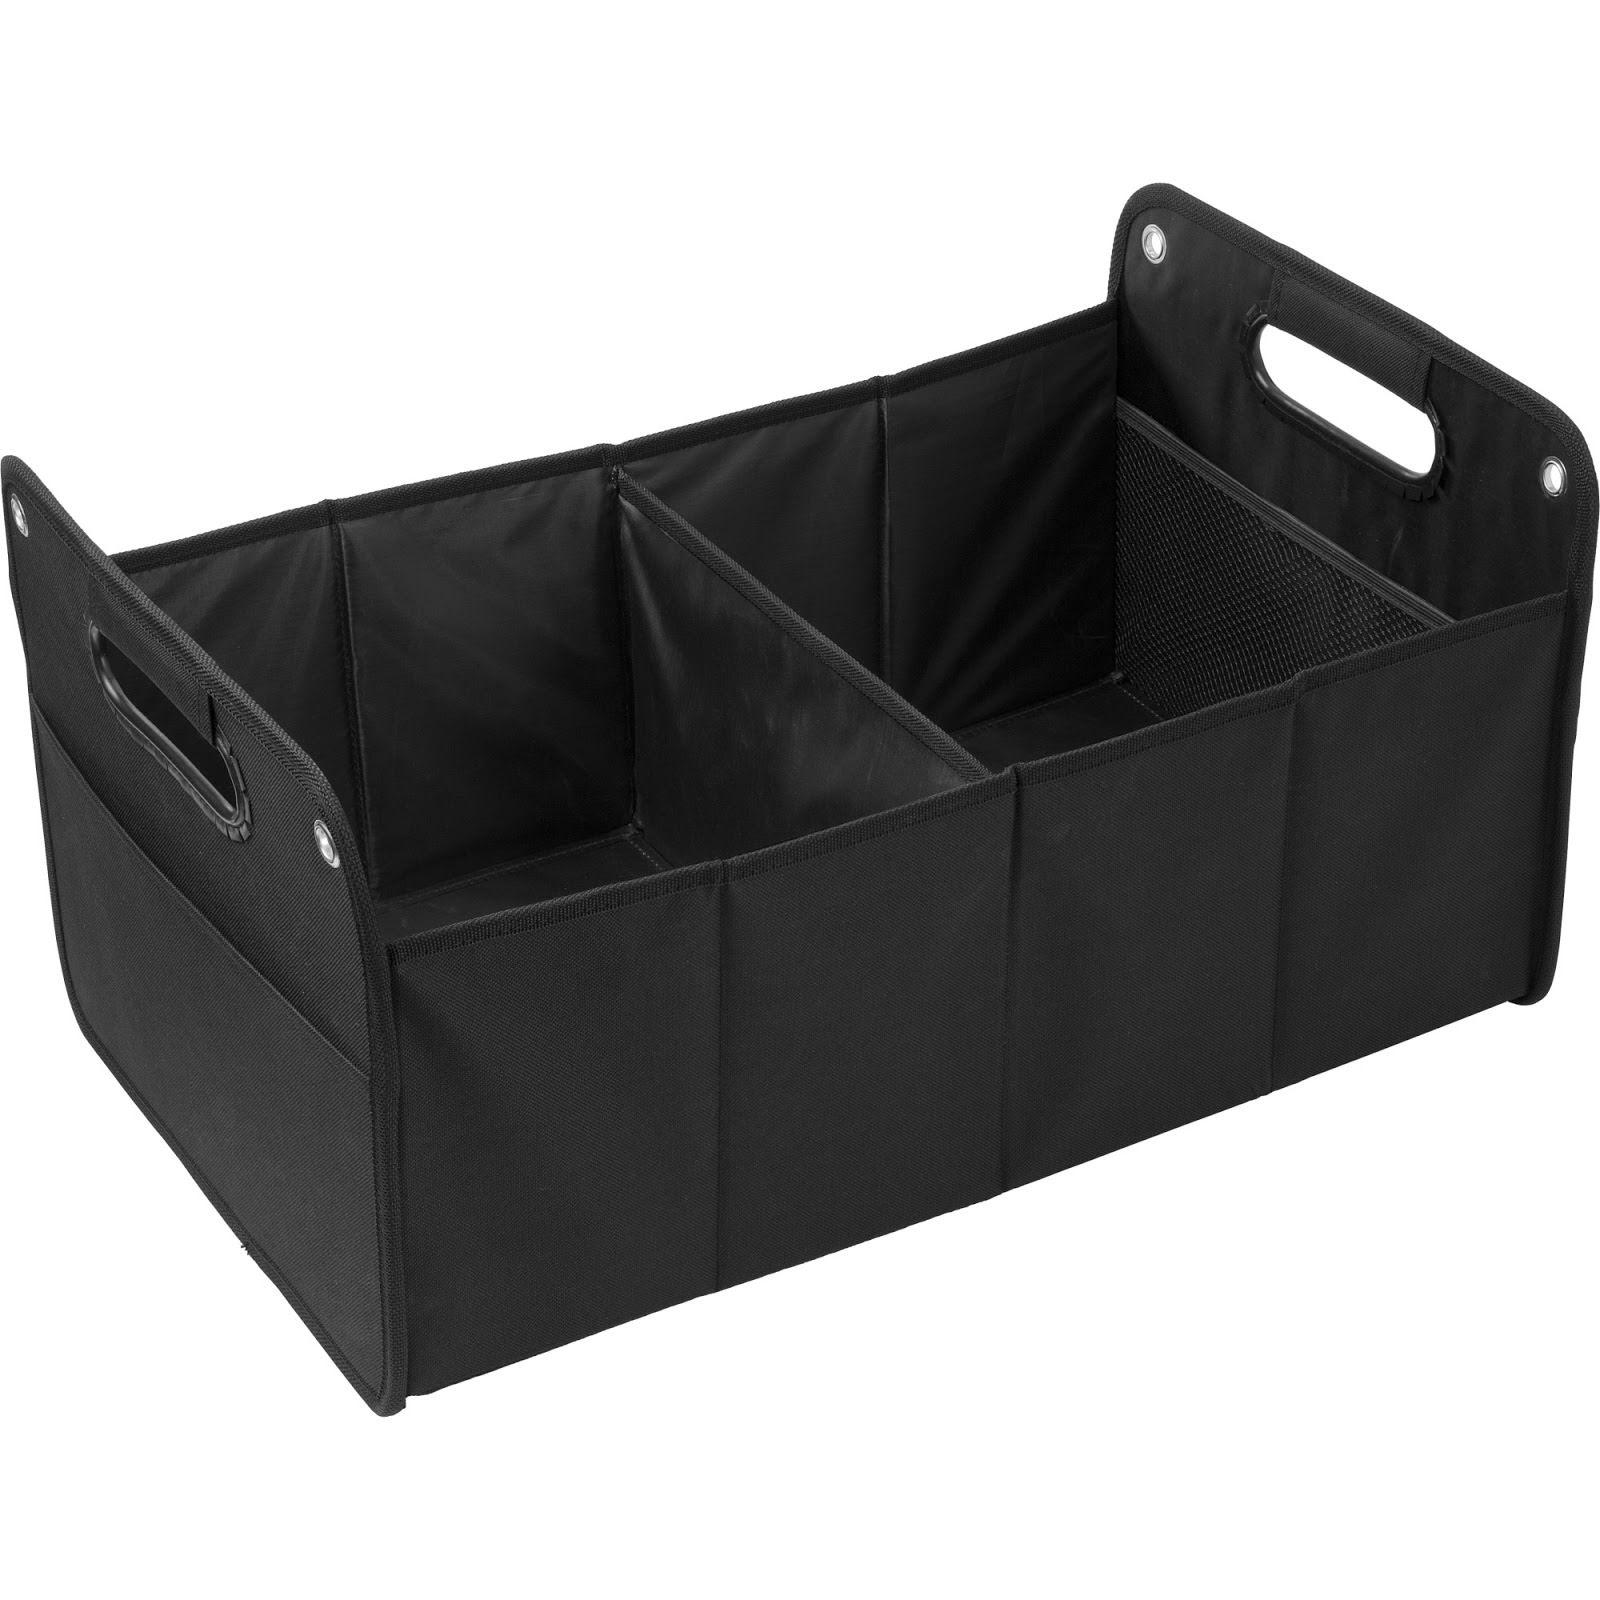 Folding Car Storage Box